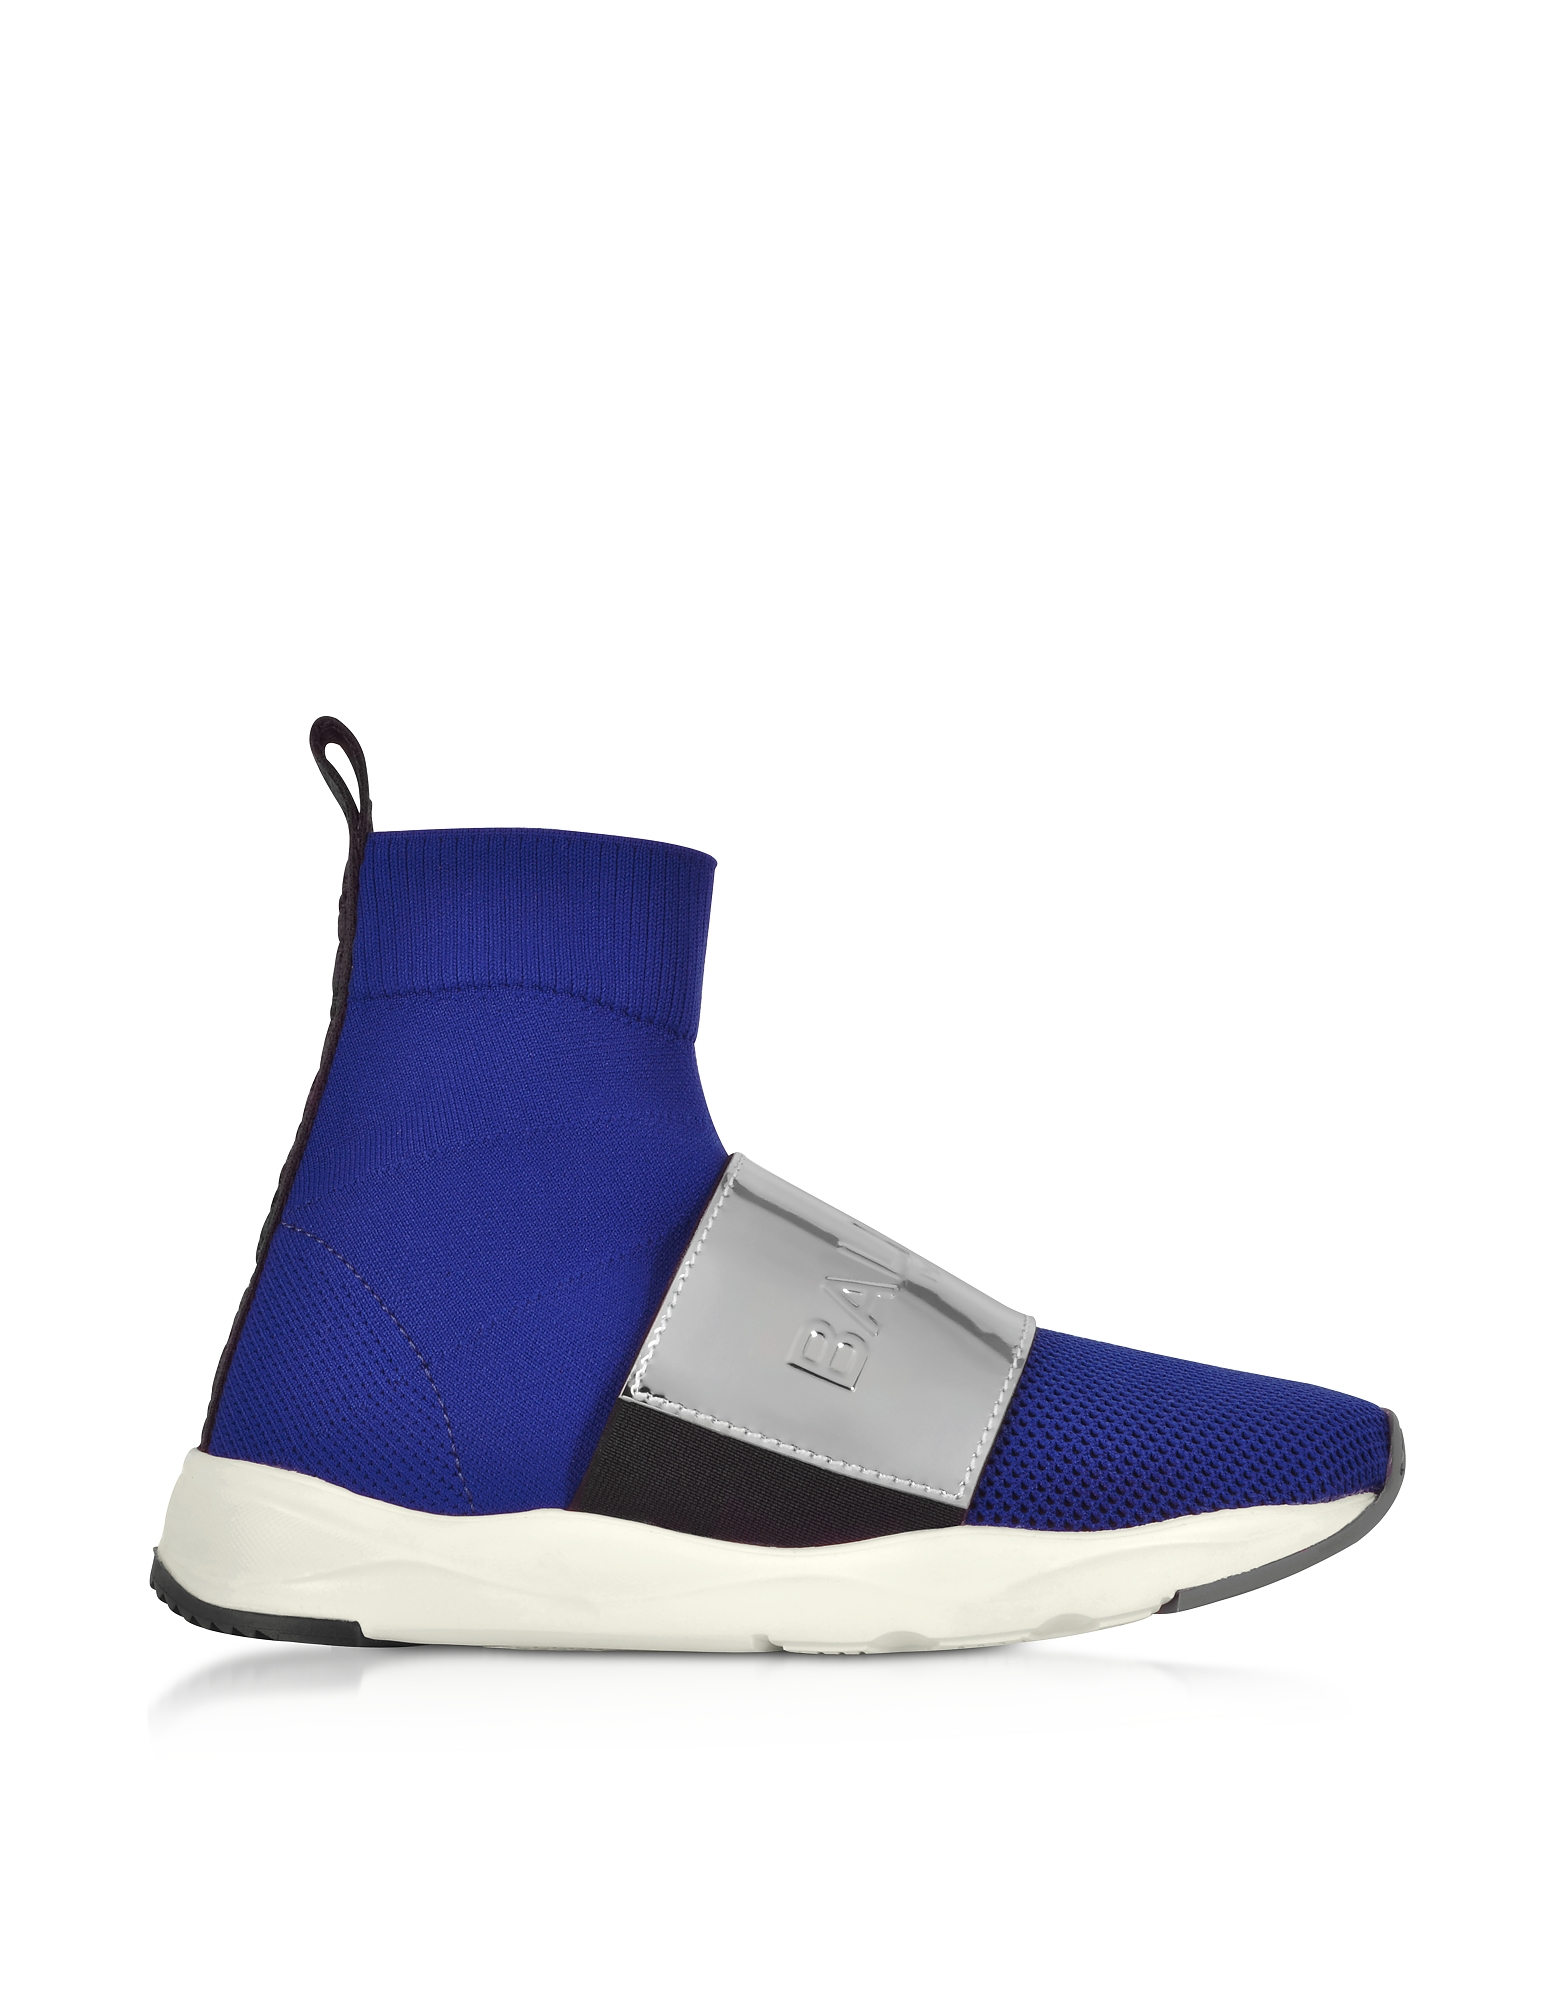 Balmain Designer Shoes, Cobalt Blue & Silver Cameron Knit Sock Sneakers